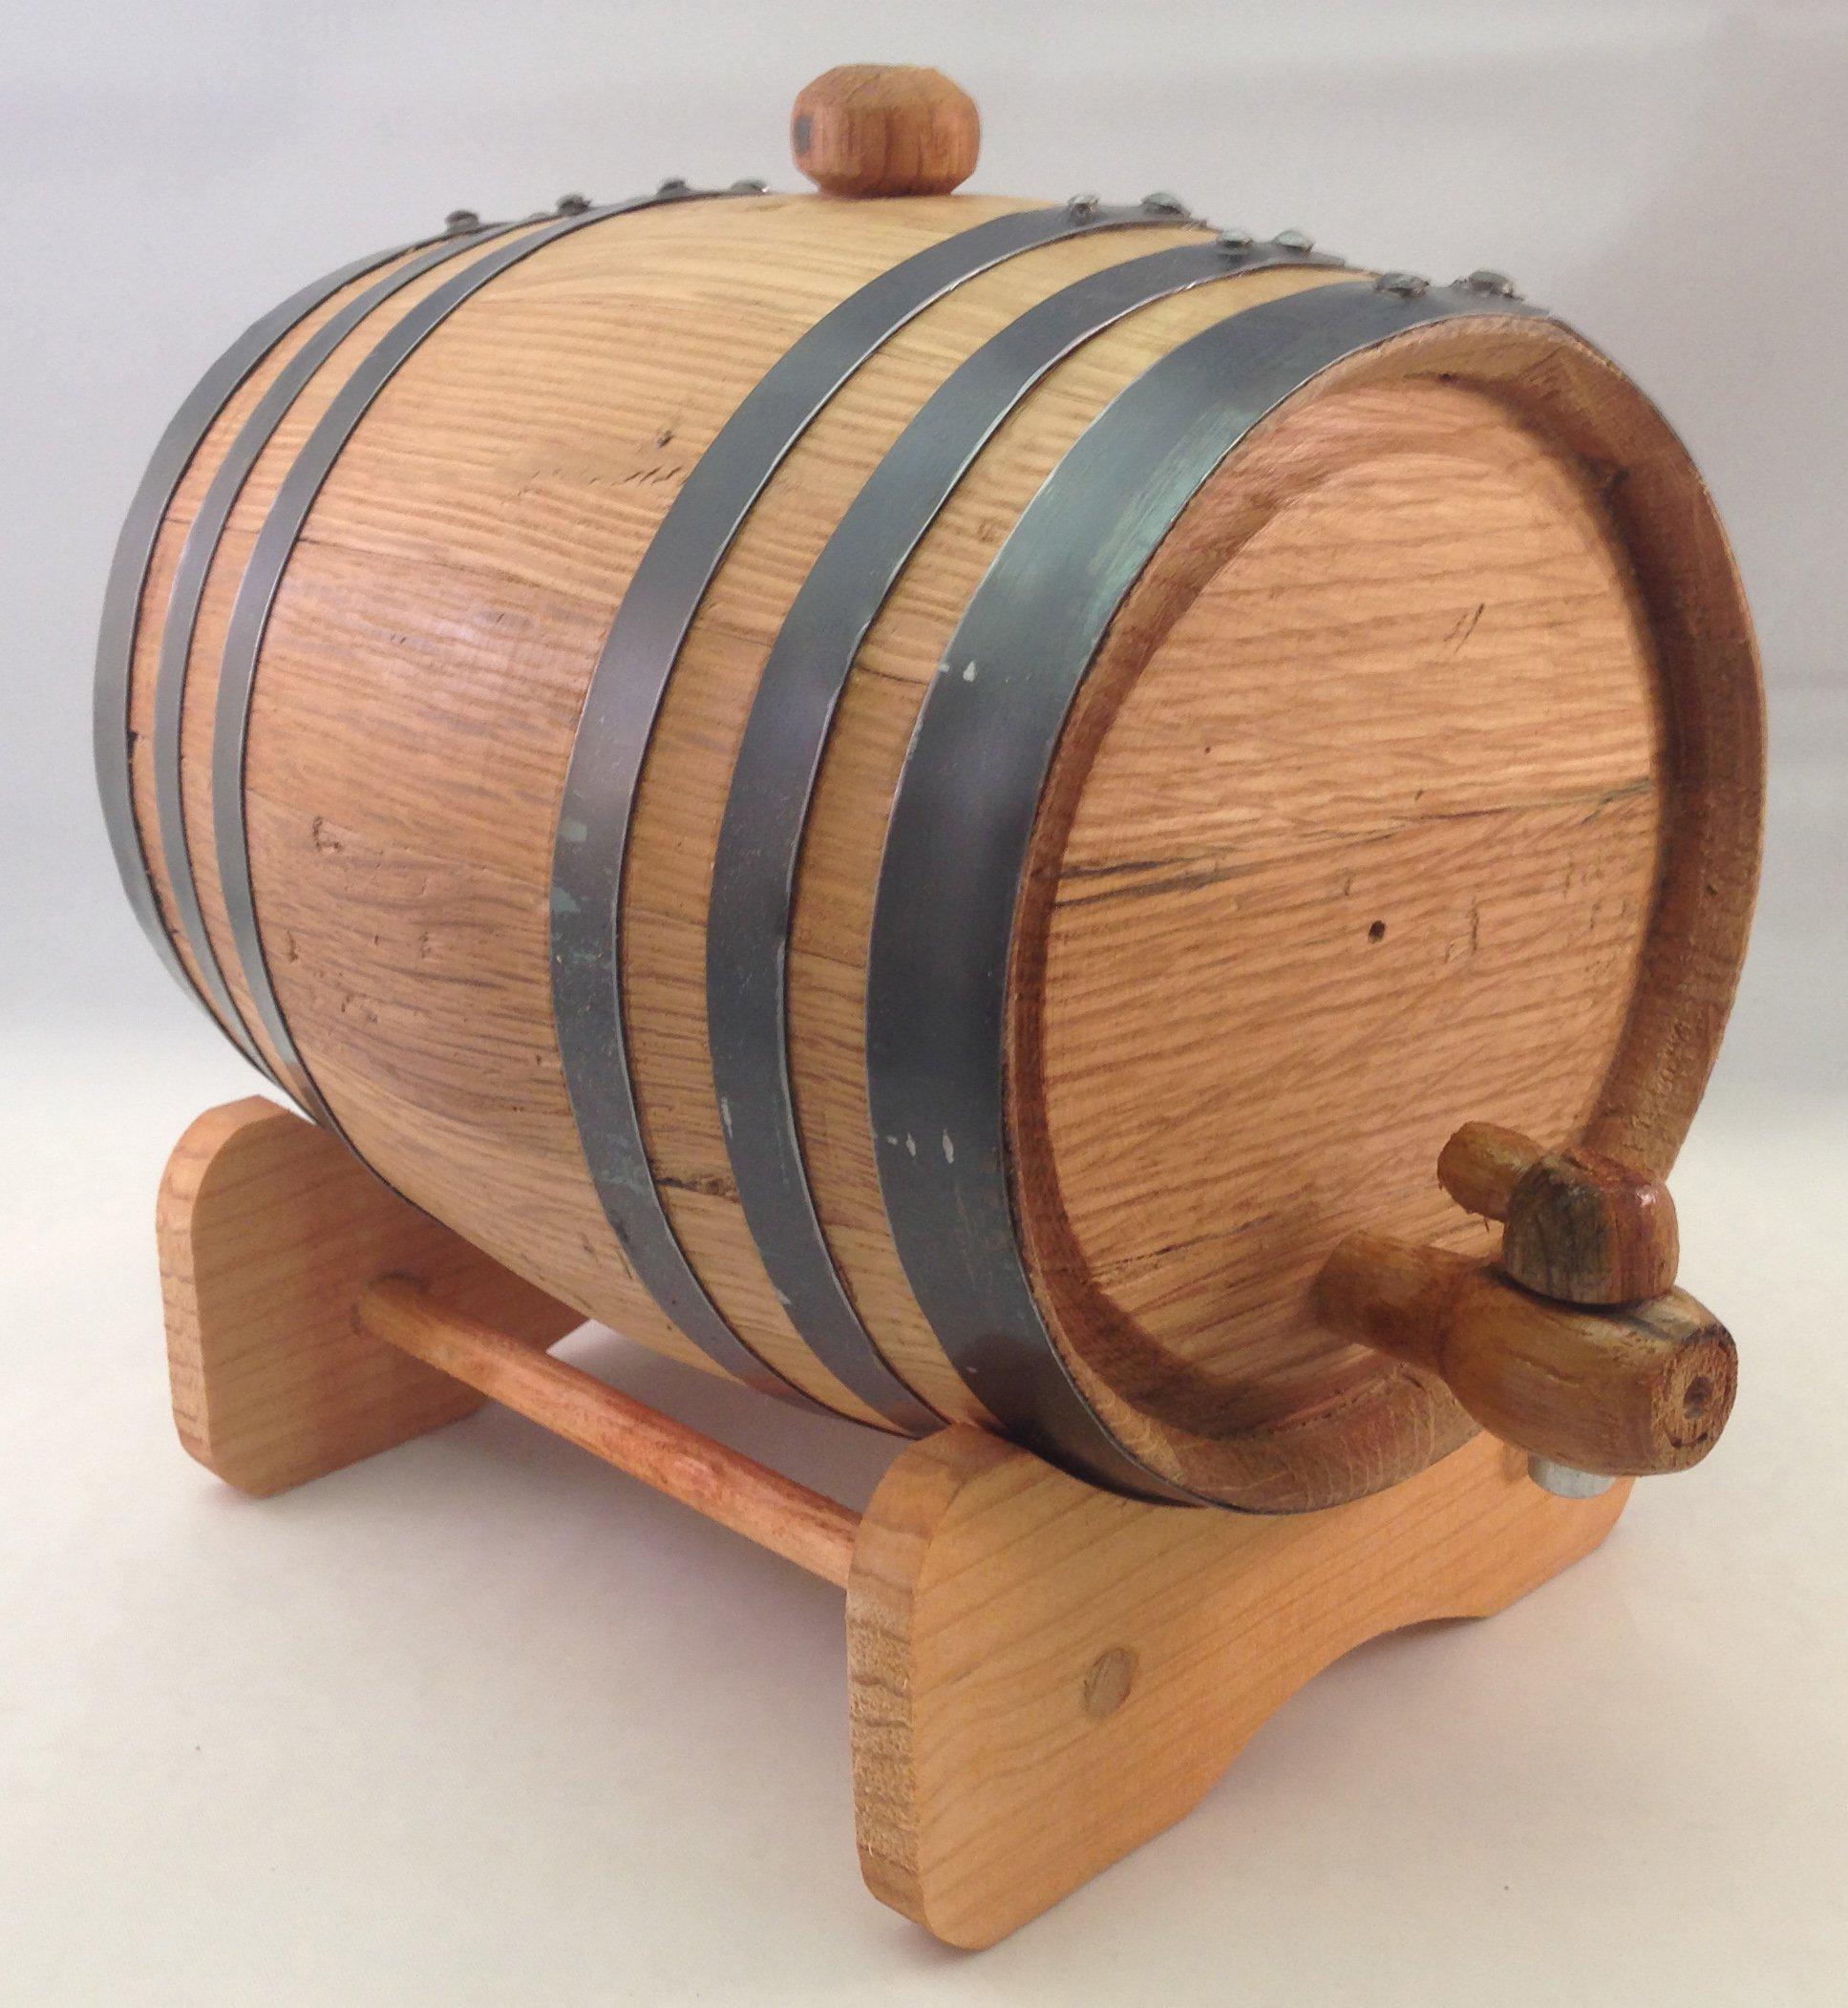 Premium Charred American Oak Aging Barrel - No Engraving (10 Liter) by Red Head Barrels (Image #1)